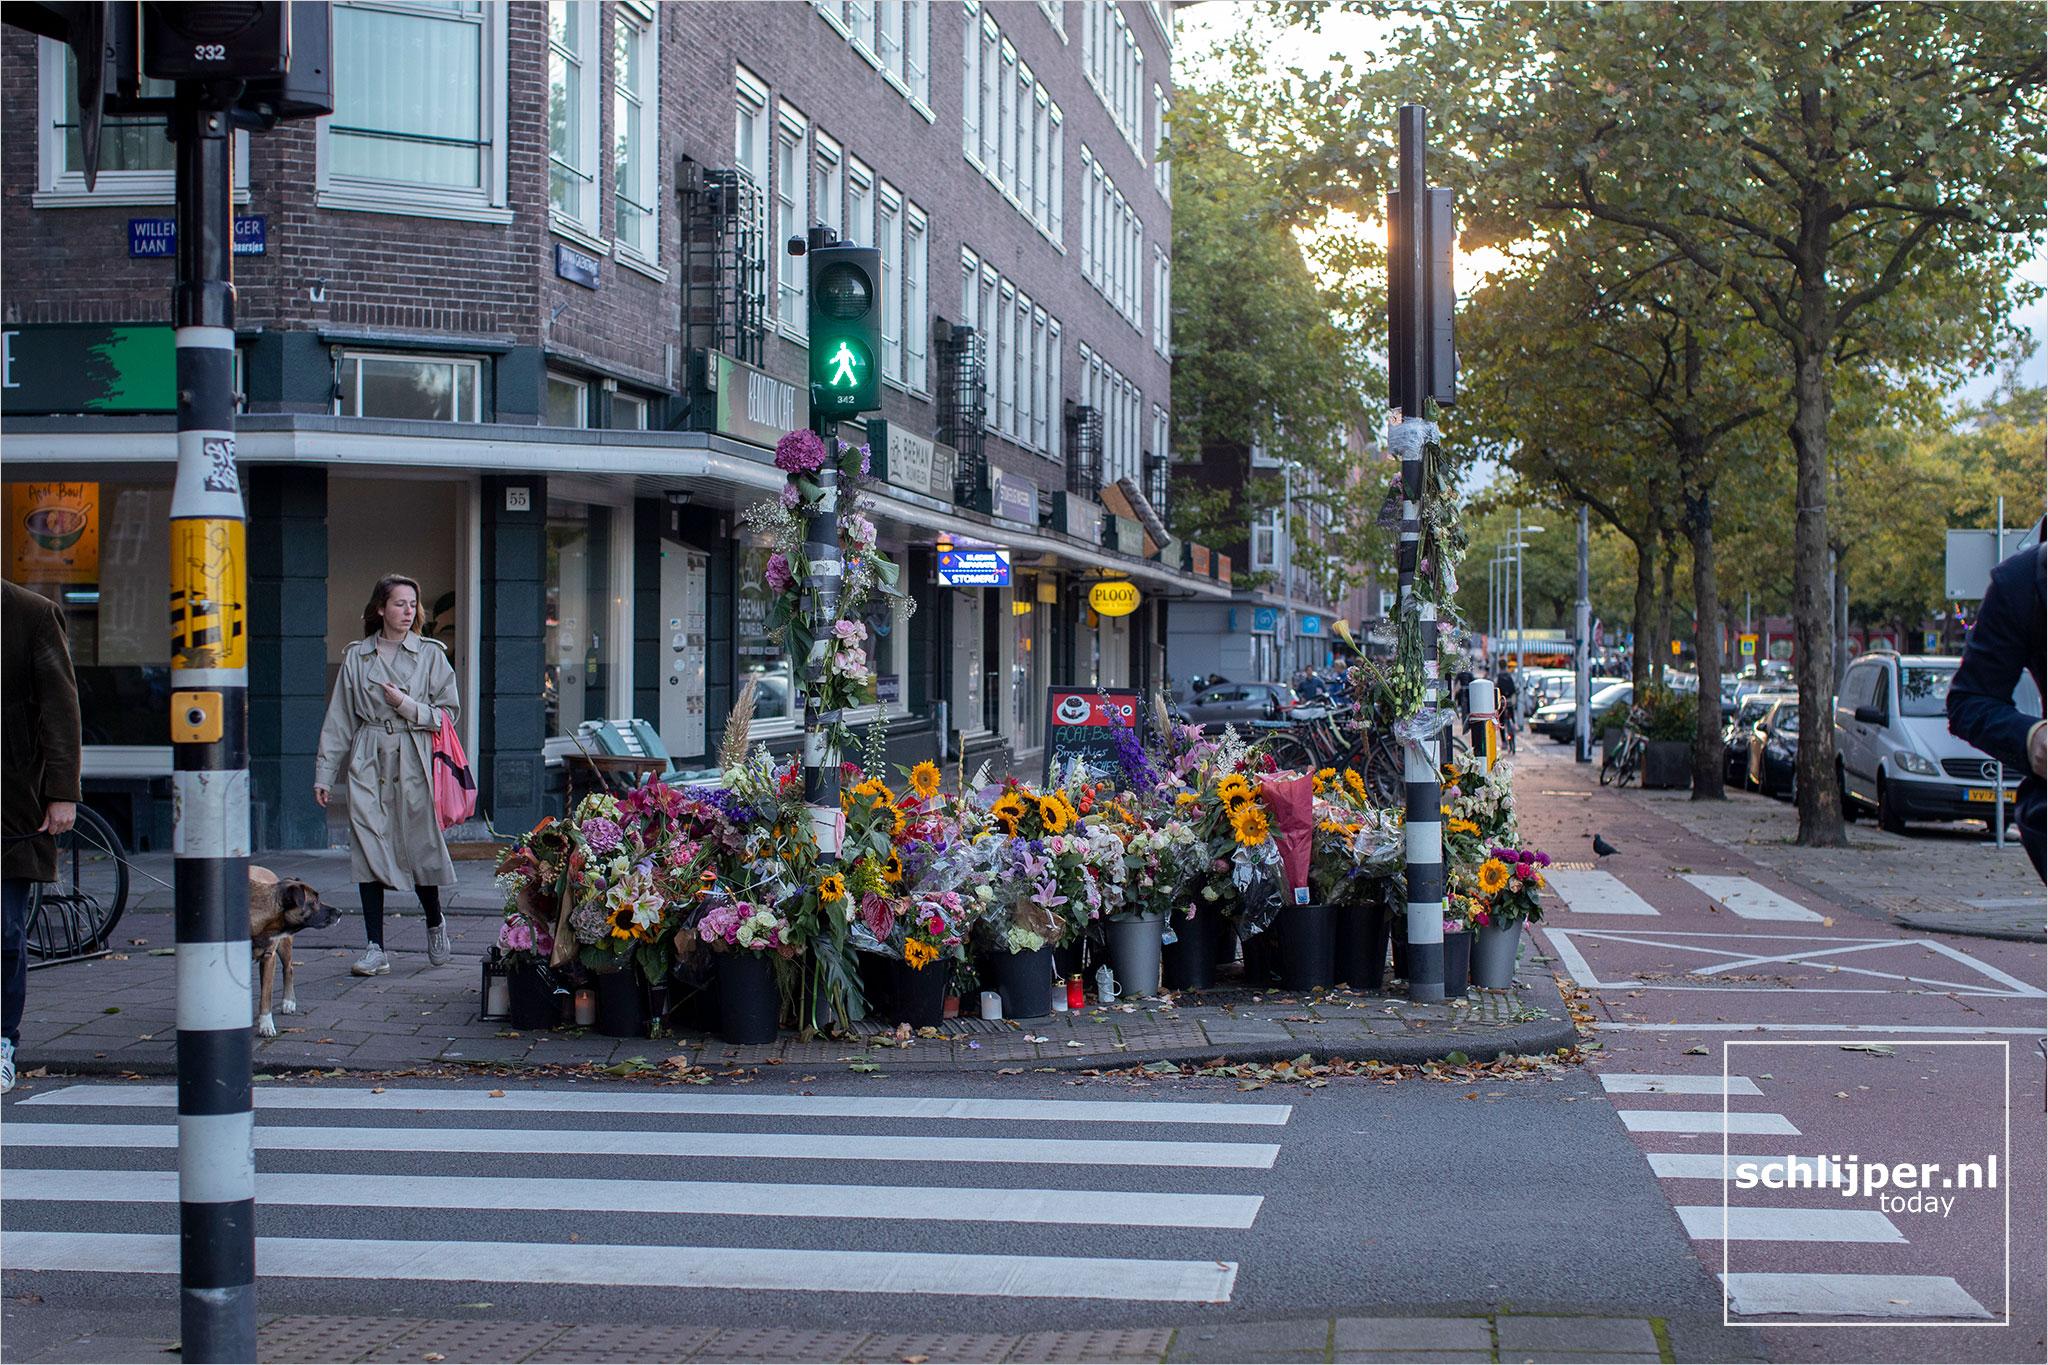 Nederland, Amsterdam, 4 oktober 2020